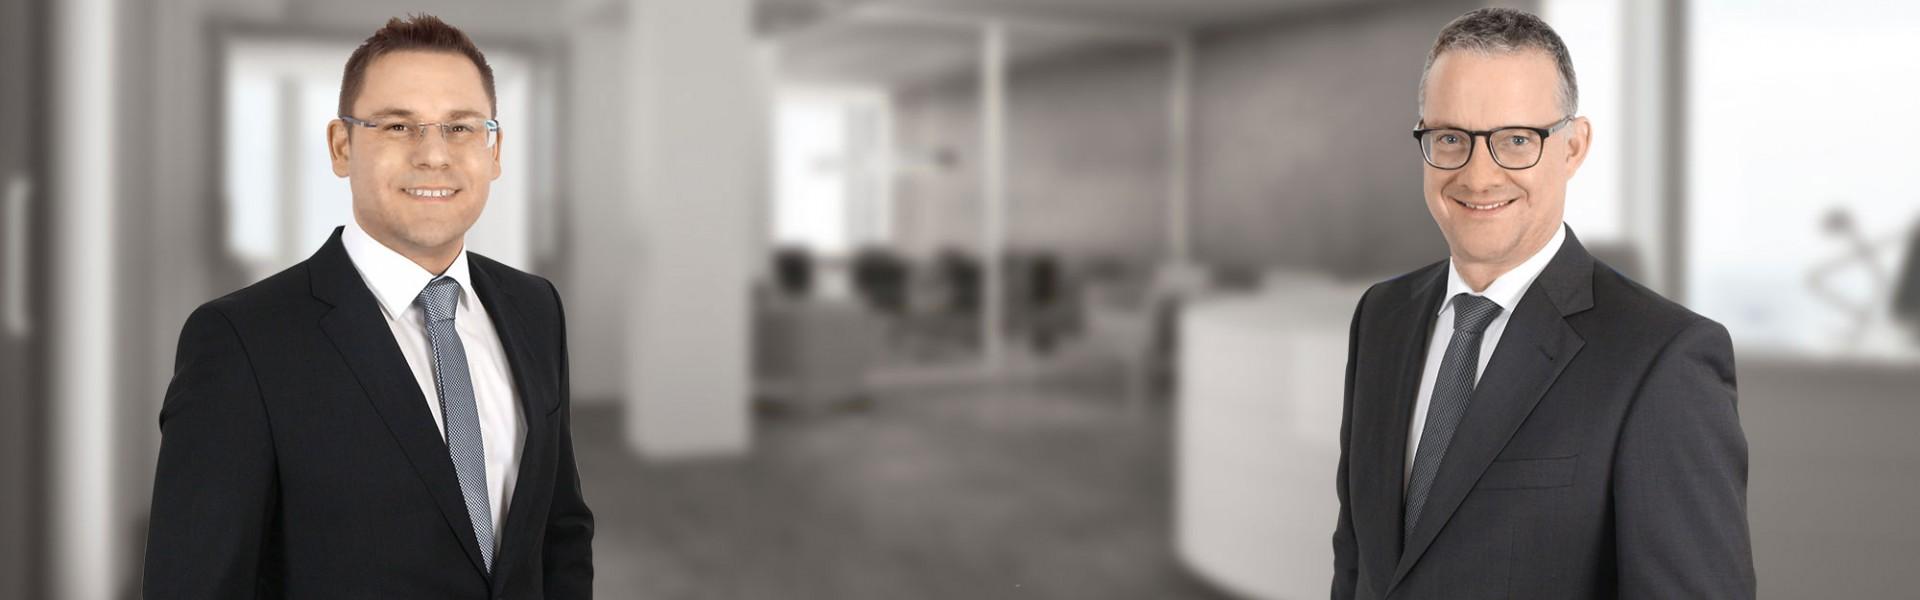 duales studium bachelor of arts ba. Black Bedroom Furniture Sets. Home Design Ideas